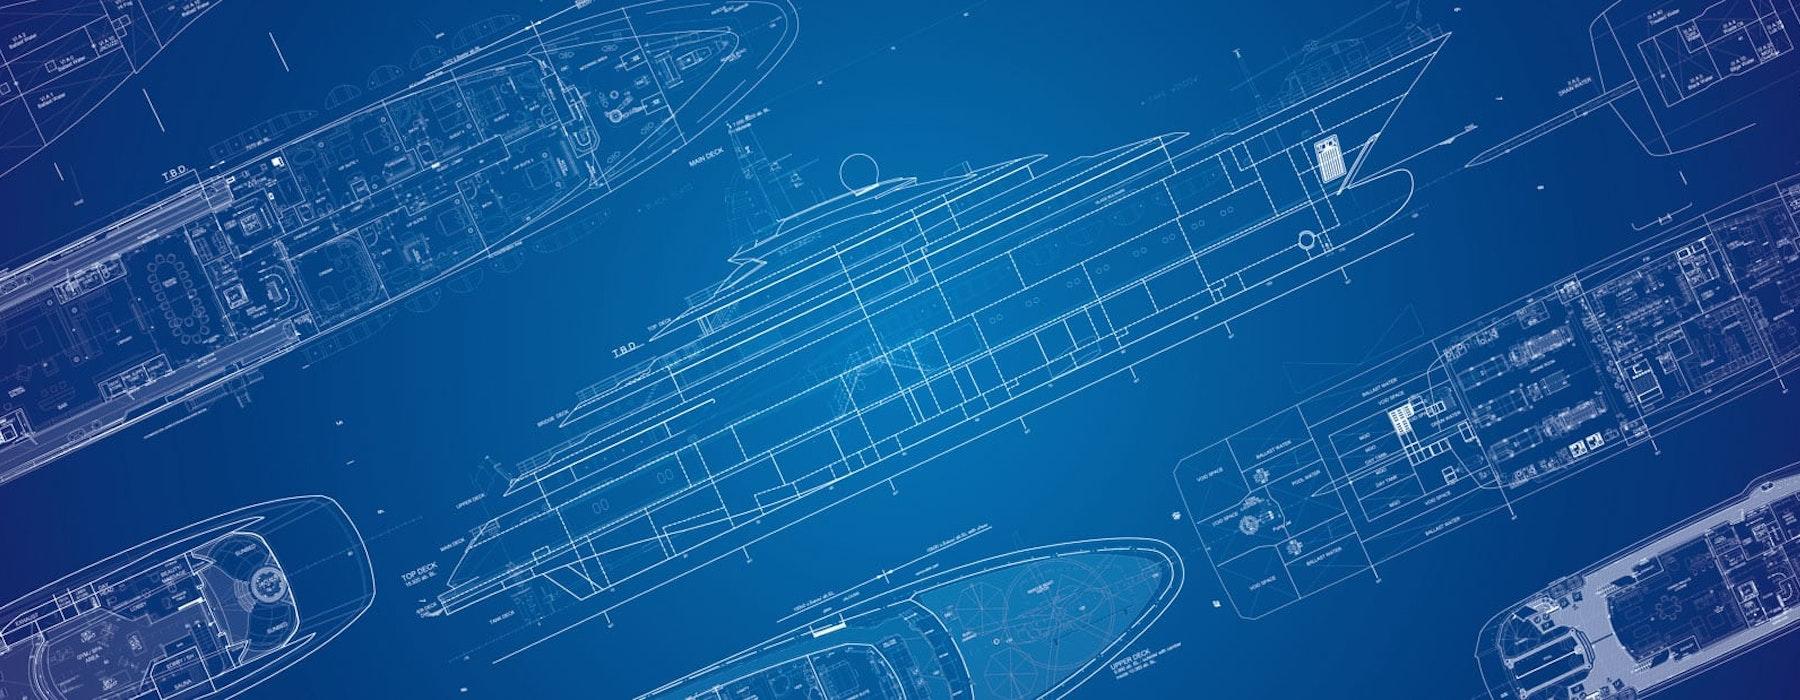 Luxury Yacht Construction Blueprint